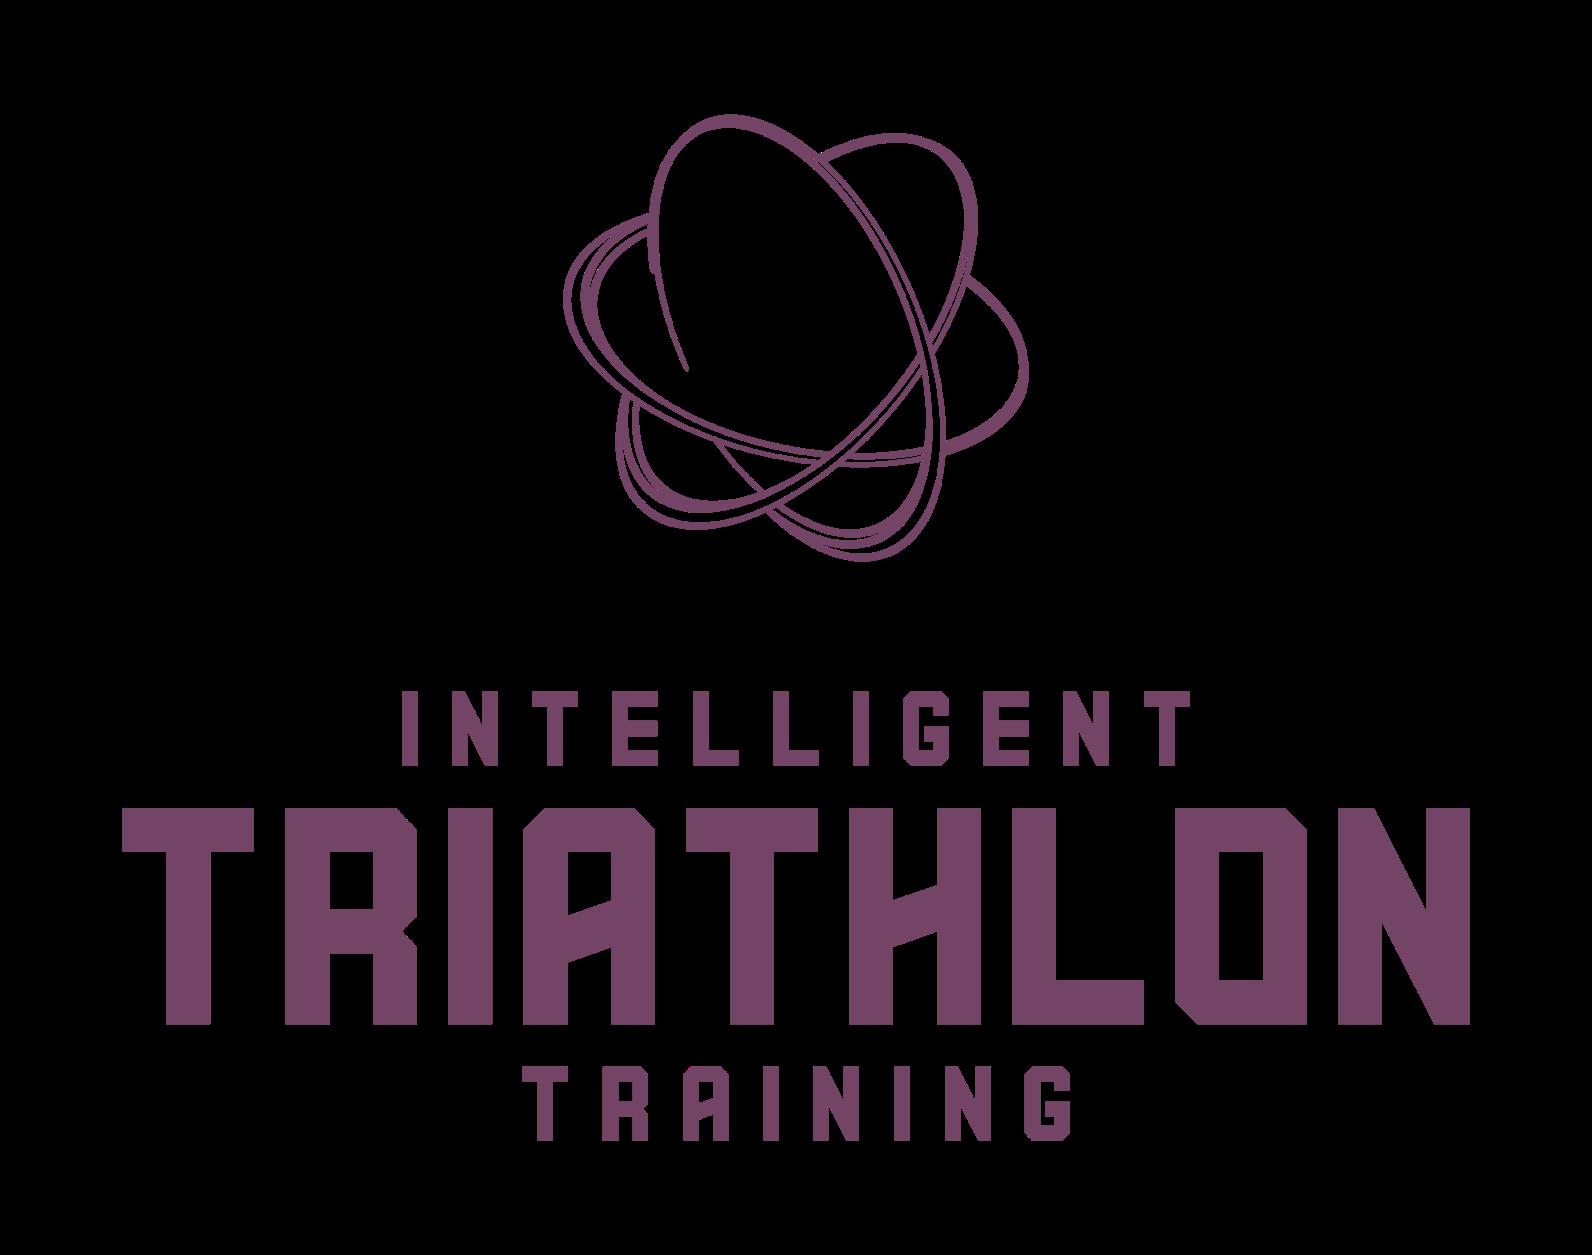 Intelligent Triathlon Training Logo